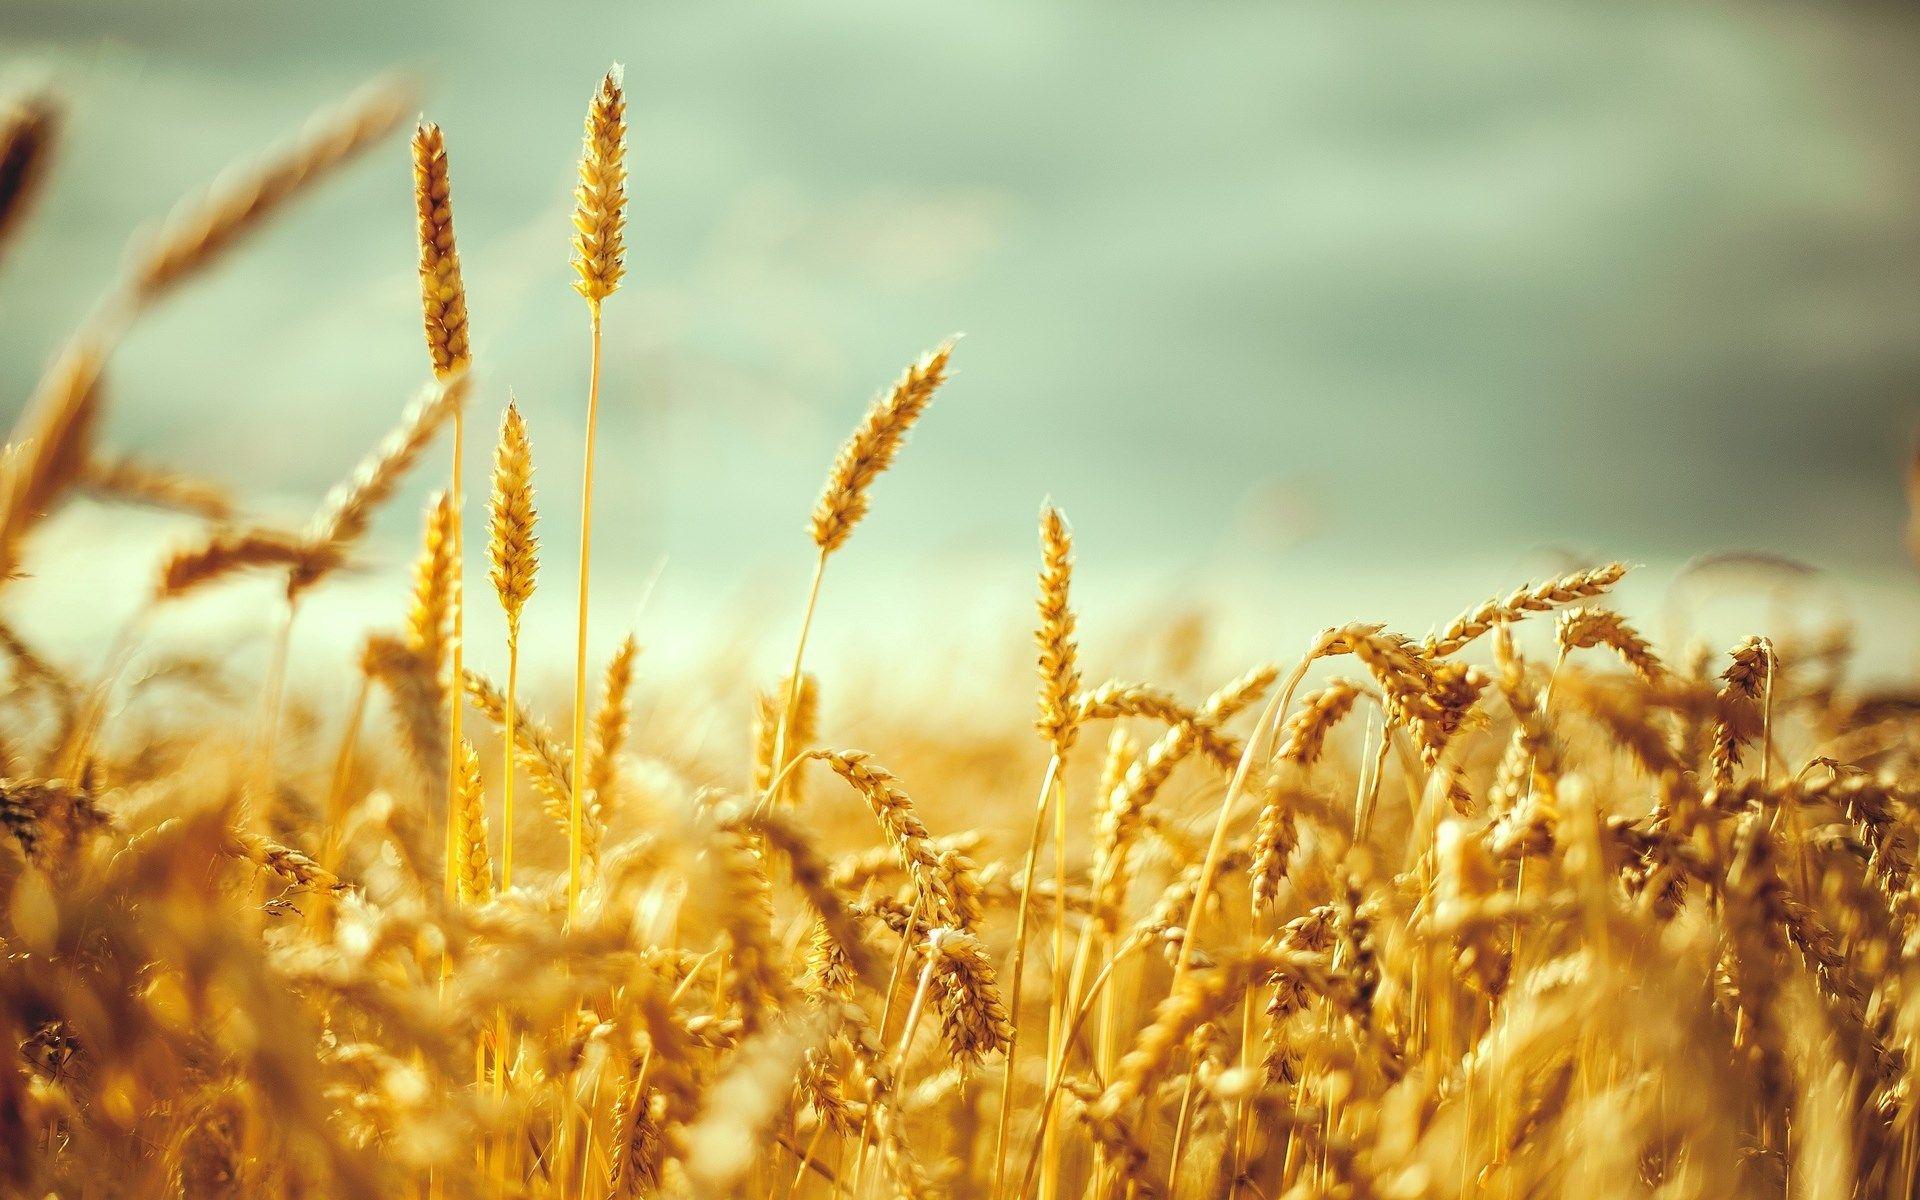 Wheat Wave Analysis – 16 December, 2019